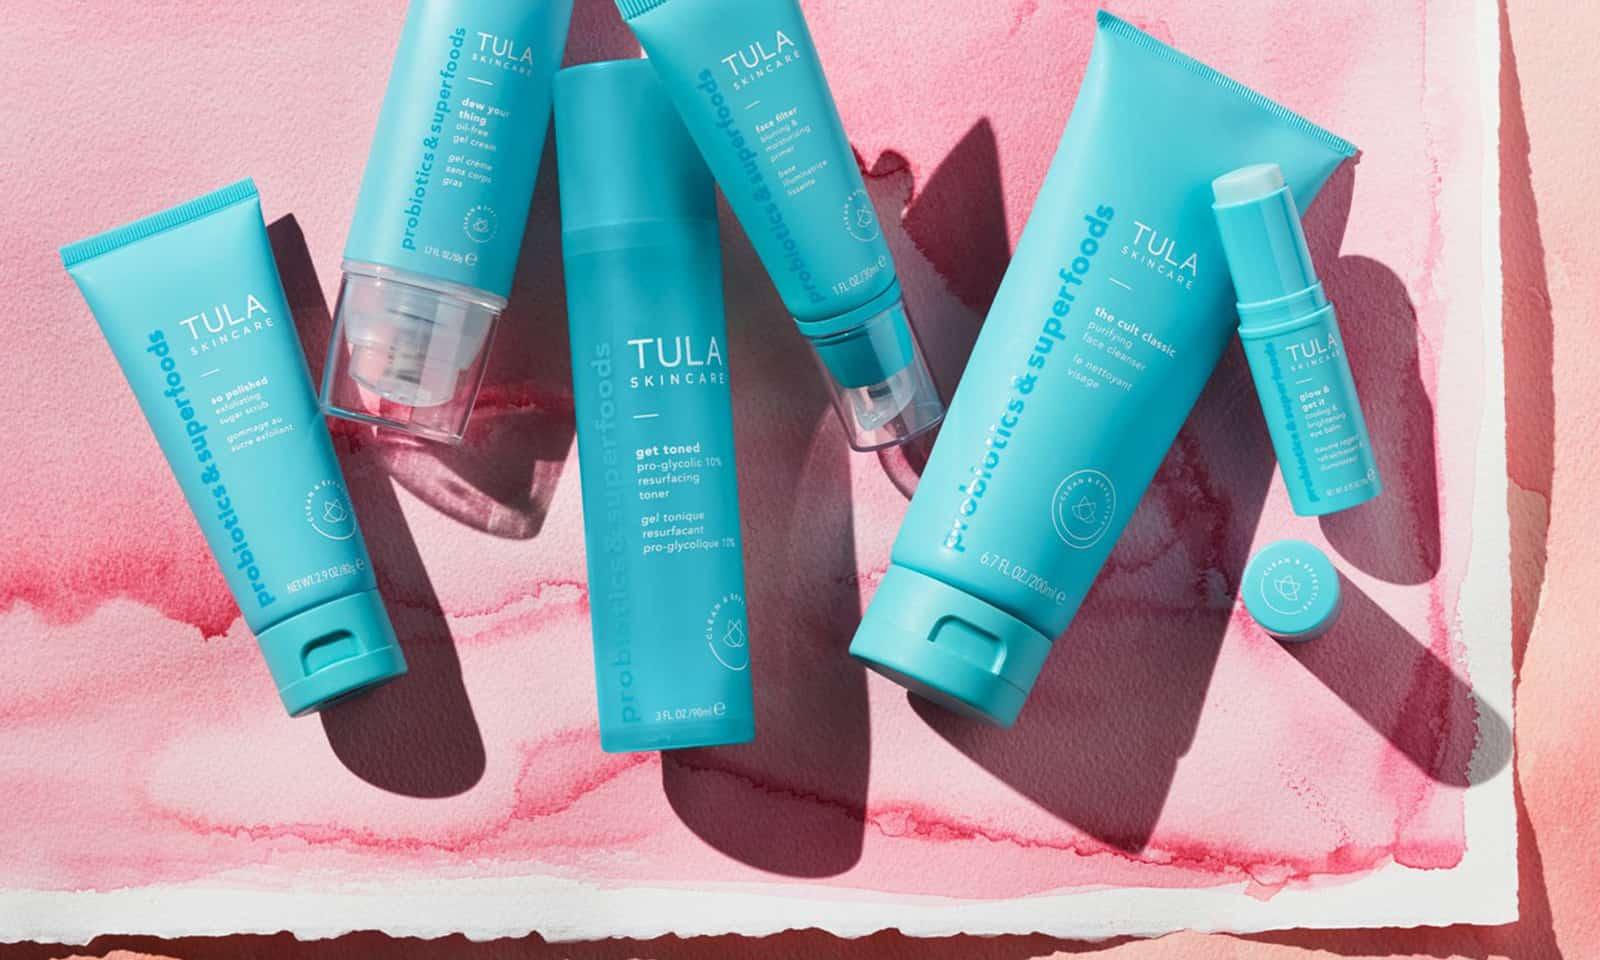 tula-produts-beauty-nighttime-routine-products-on-pastel-background